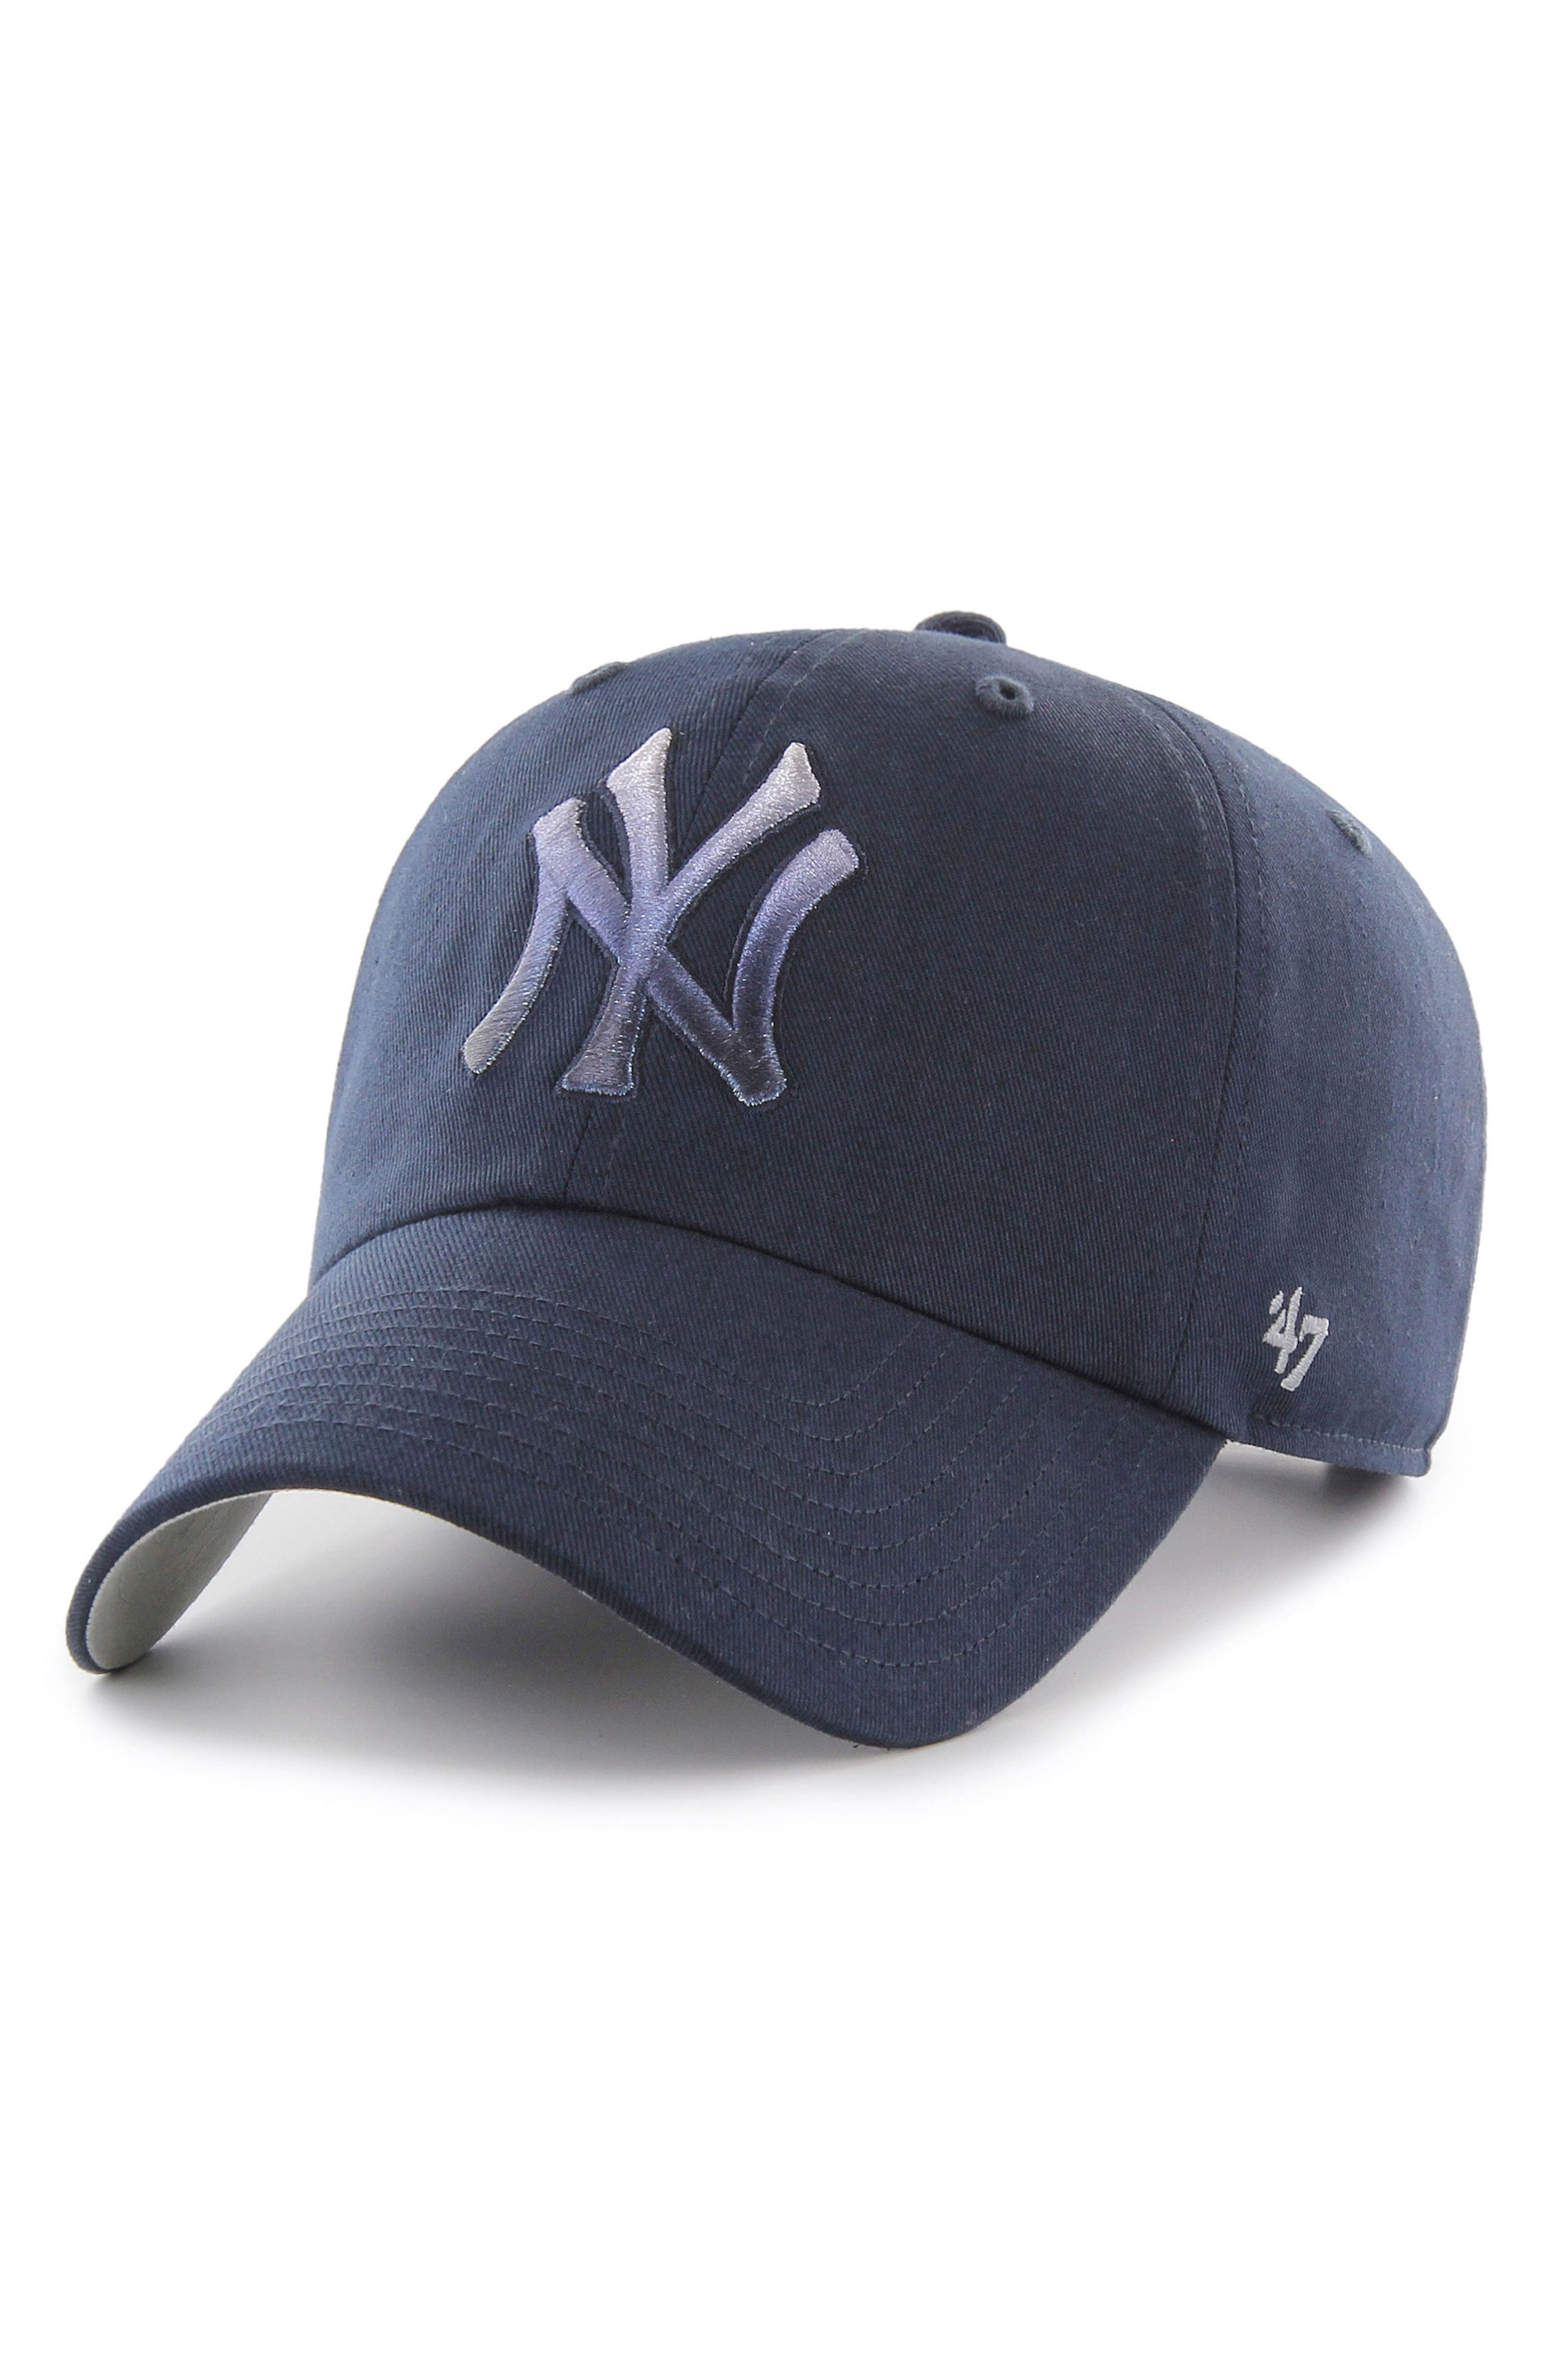 '47 Falton MLB Logo Ball Cap